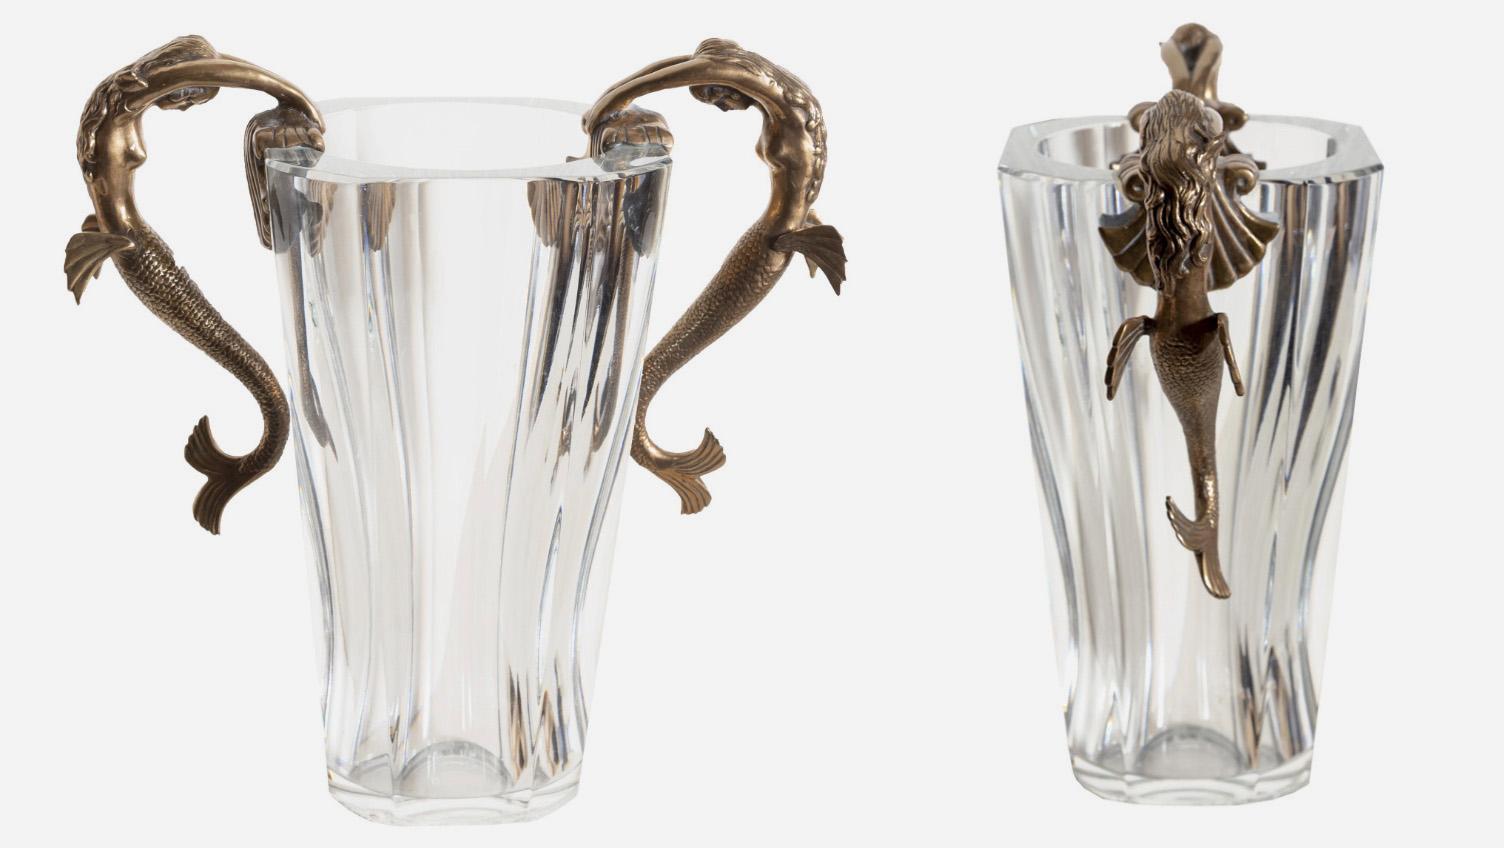 Эрте. Ваза из хрусталя Баккара с бронзовыми русалками, 1985